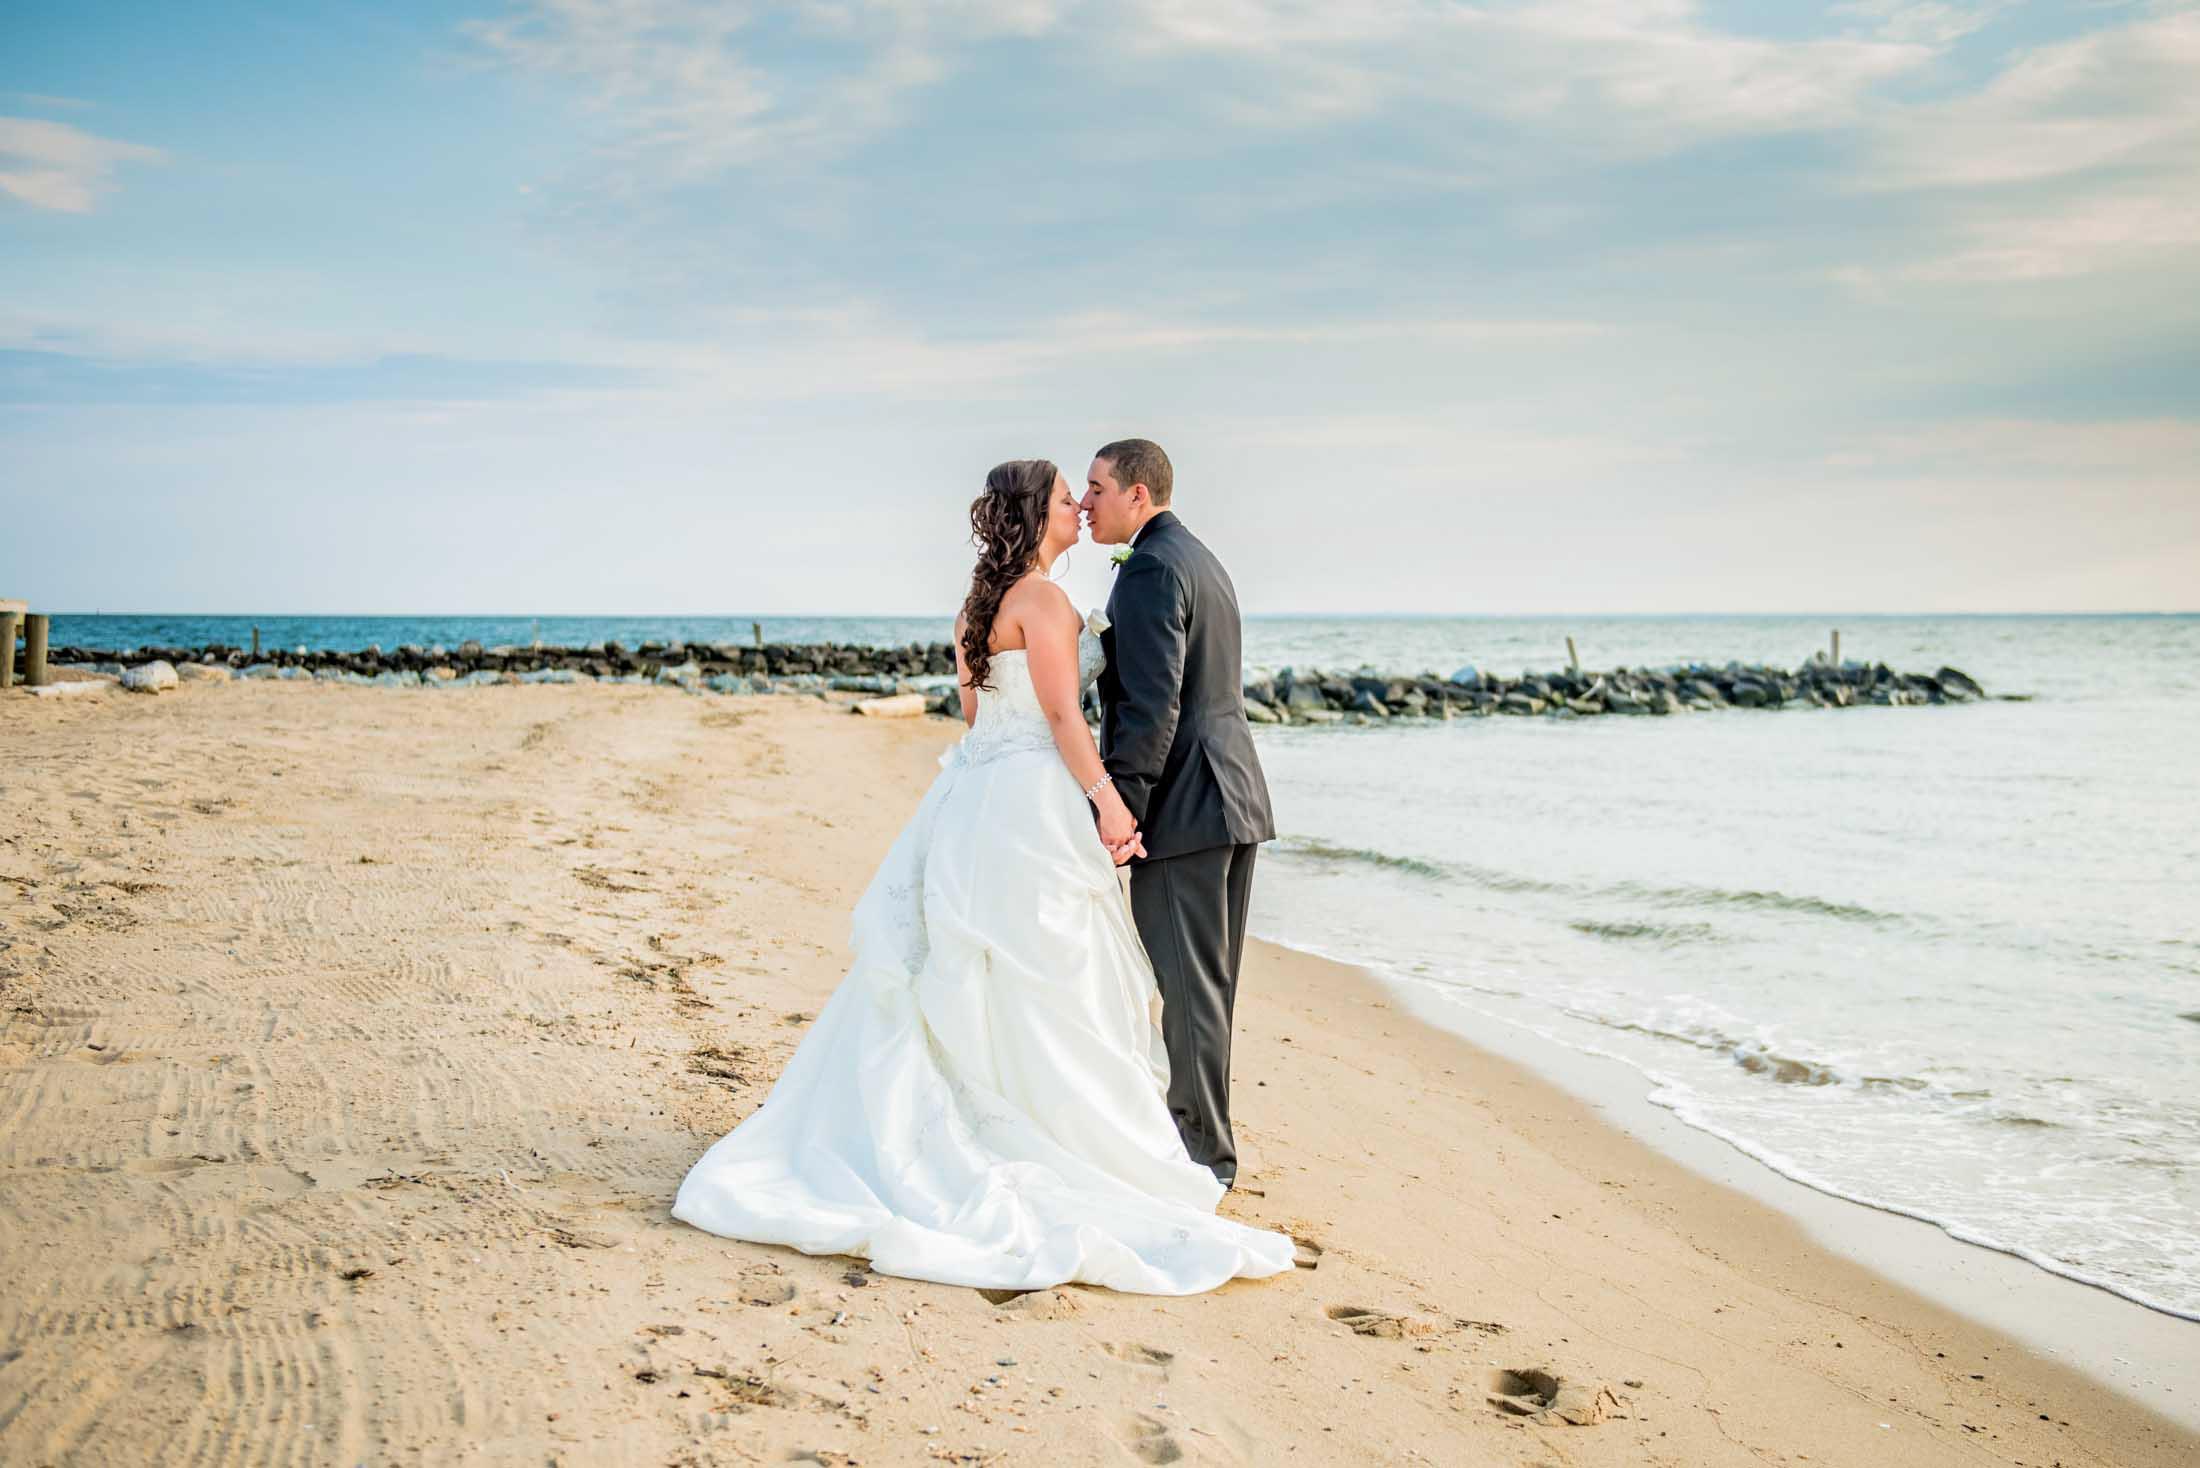 dc+metro+wedding+photographer+vadym+guliuk+photography+wedding+bride+and+groom-2026.jpg